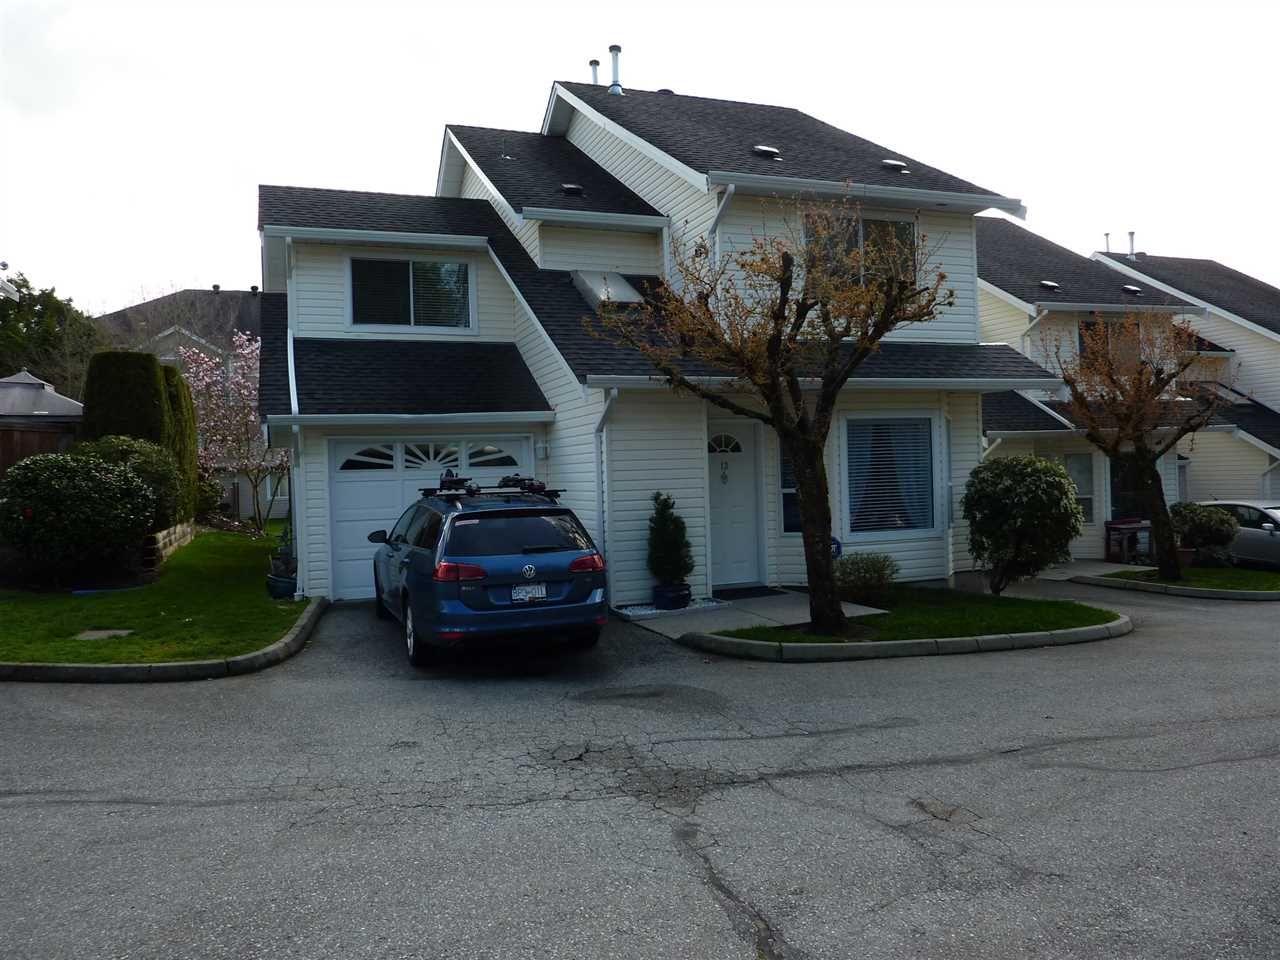 "Main Photo: 13 11588 232 Street in Maple Ridge: Cottonwood MR Townhouse for sale in ""COTTONWOOD VILLAGE"" : MLS®# R2260675"